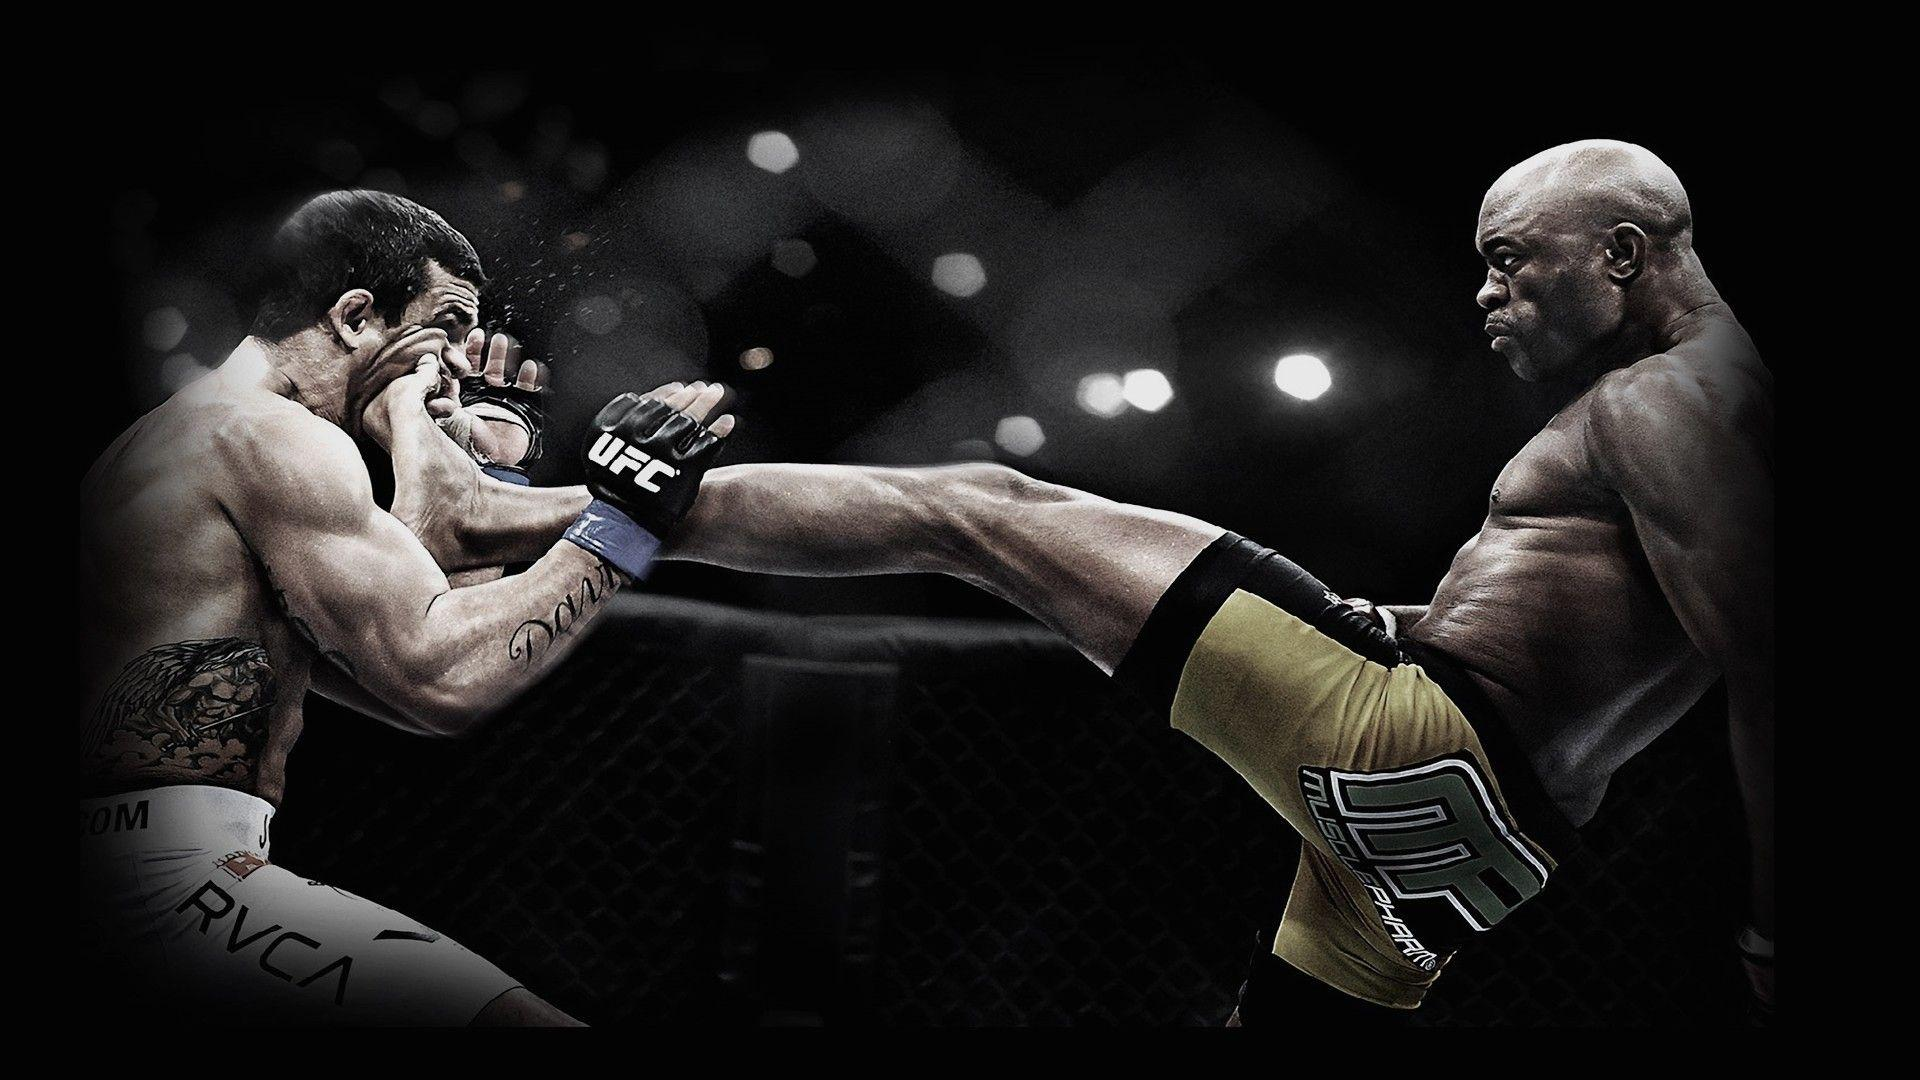 Kick Boxing Wallpapers Hd Wallpaper Cave